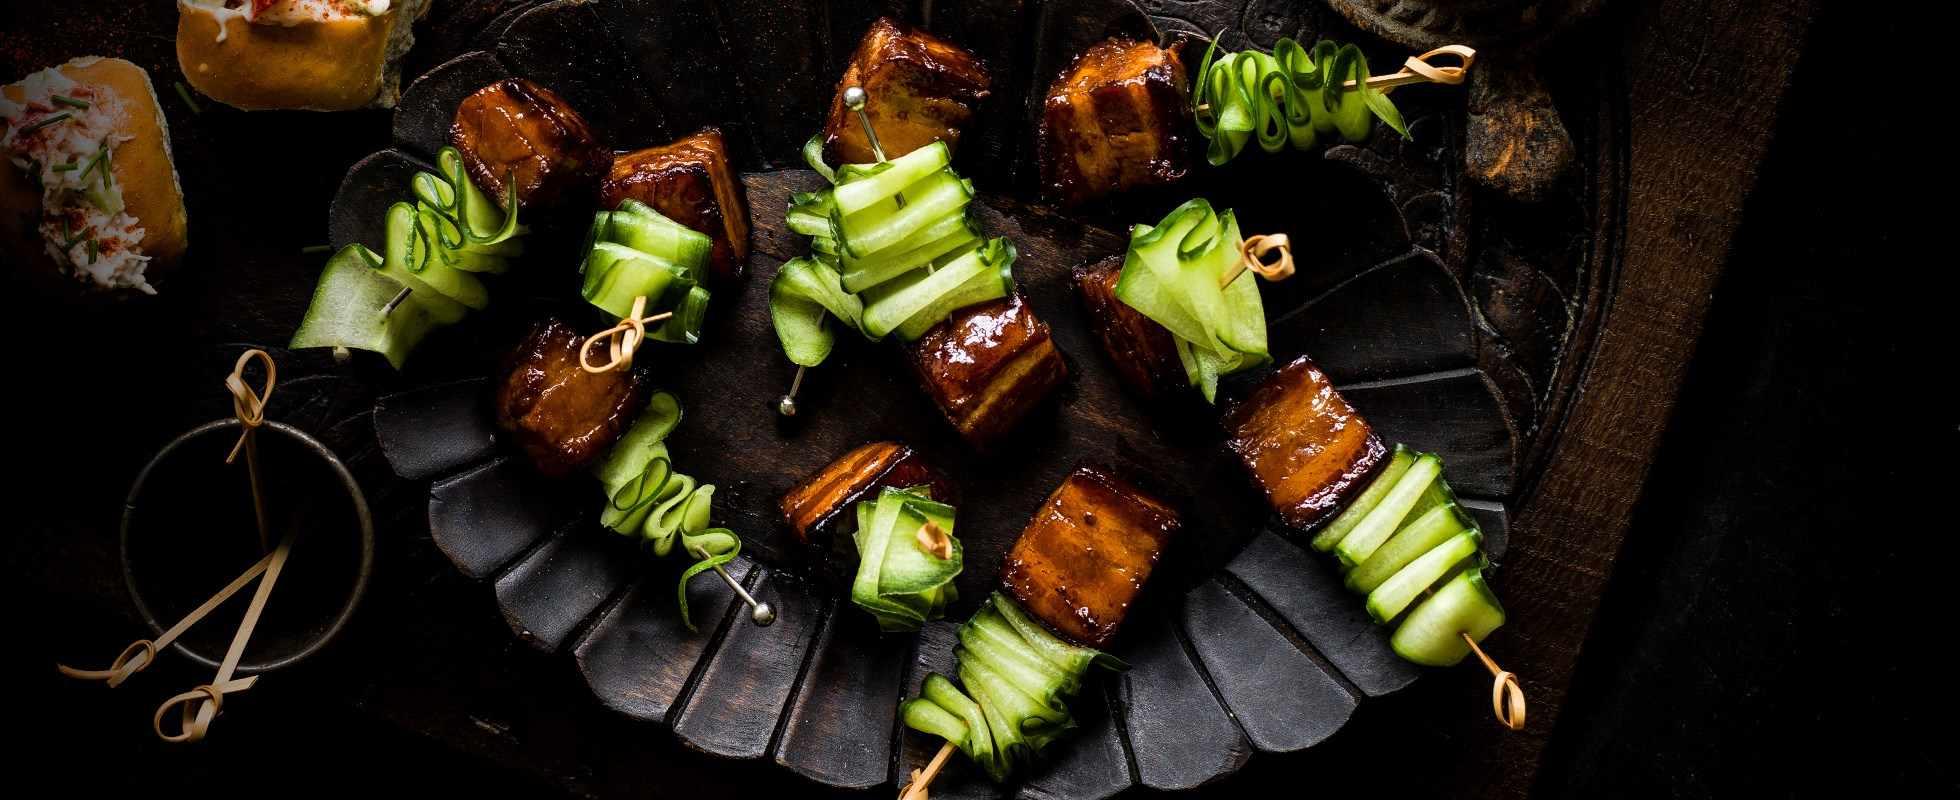 Pork-belly skewers with Vietnamese caramel sauce